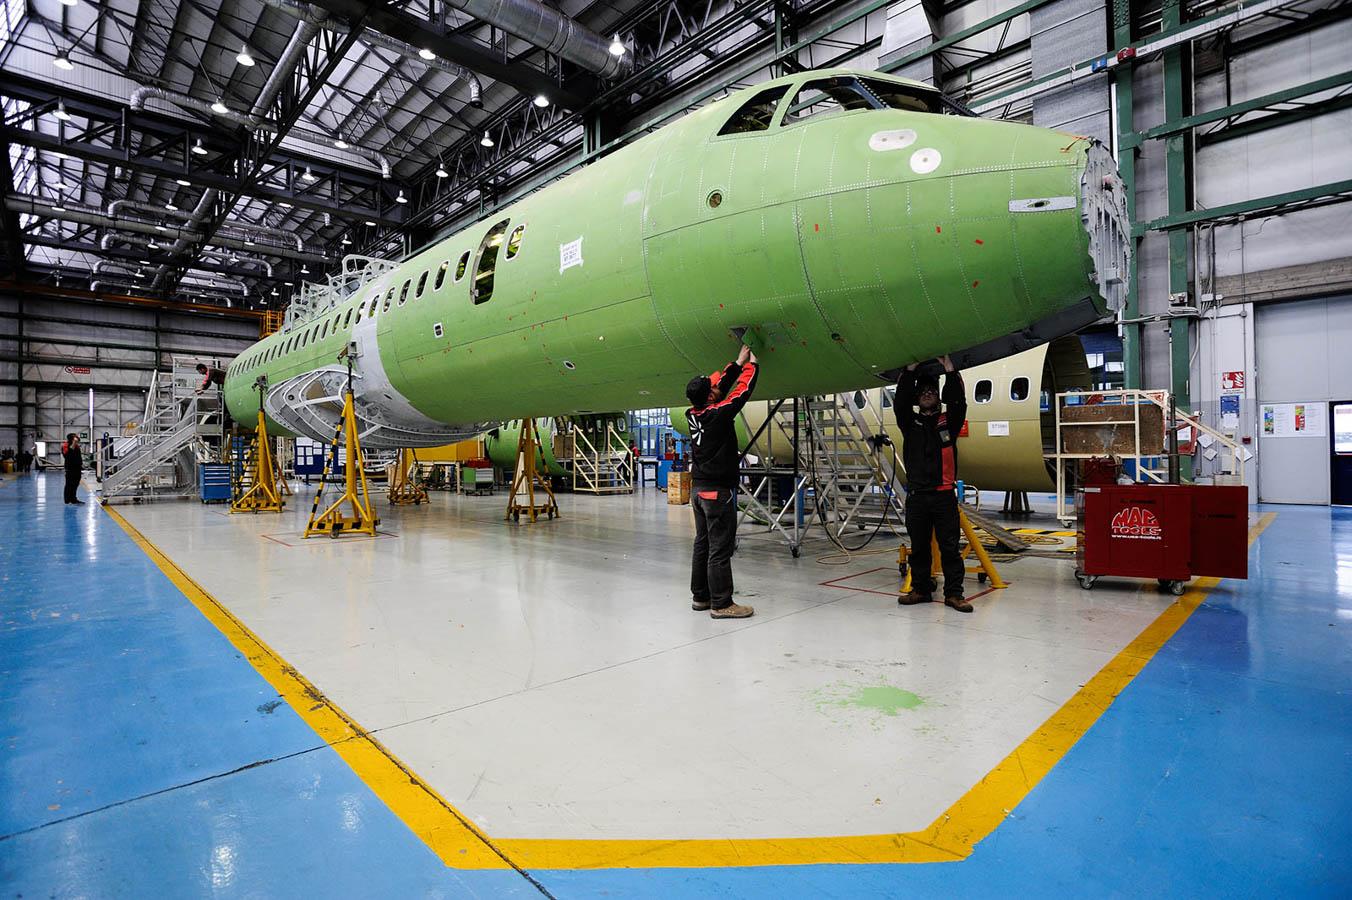 Alenia Aeronautica - Leonardo Company - Pomigliano d'Arco (NA)